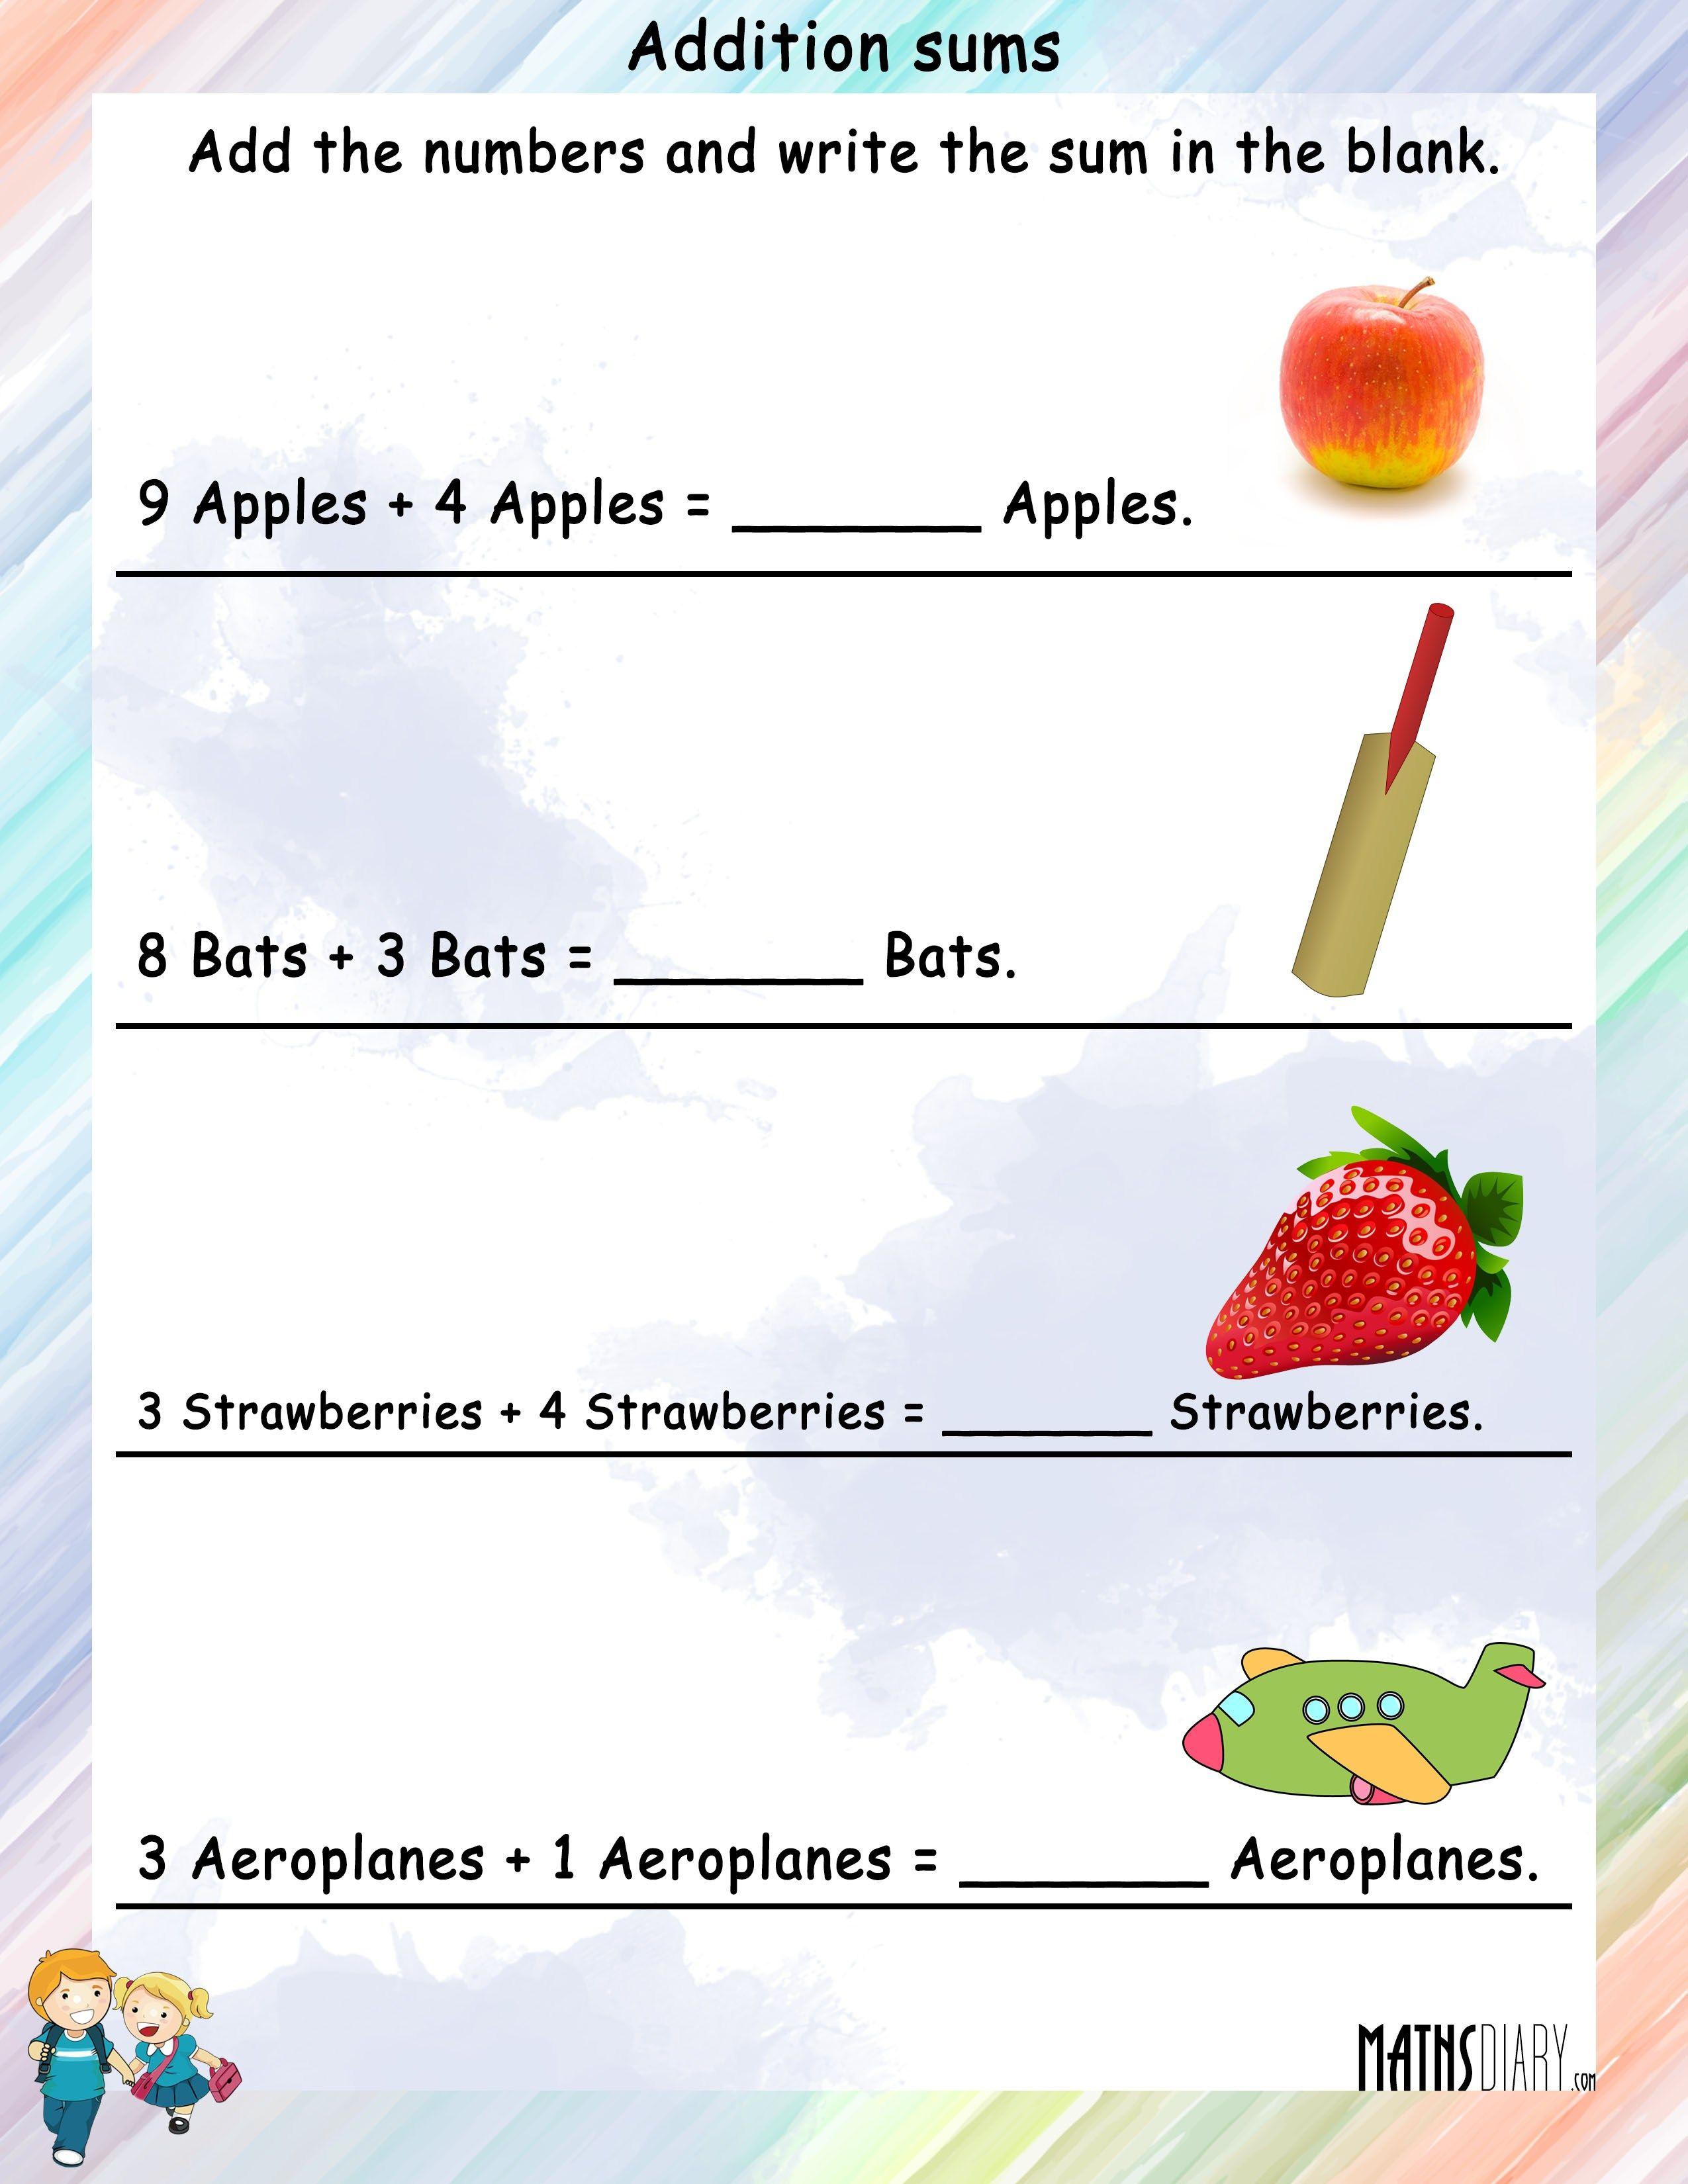 Image Result For Food Shopping Worksheet Math Problems